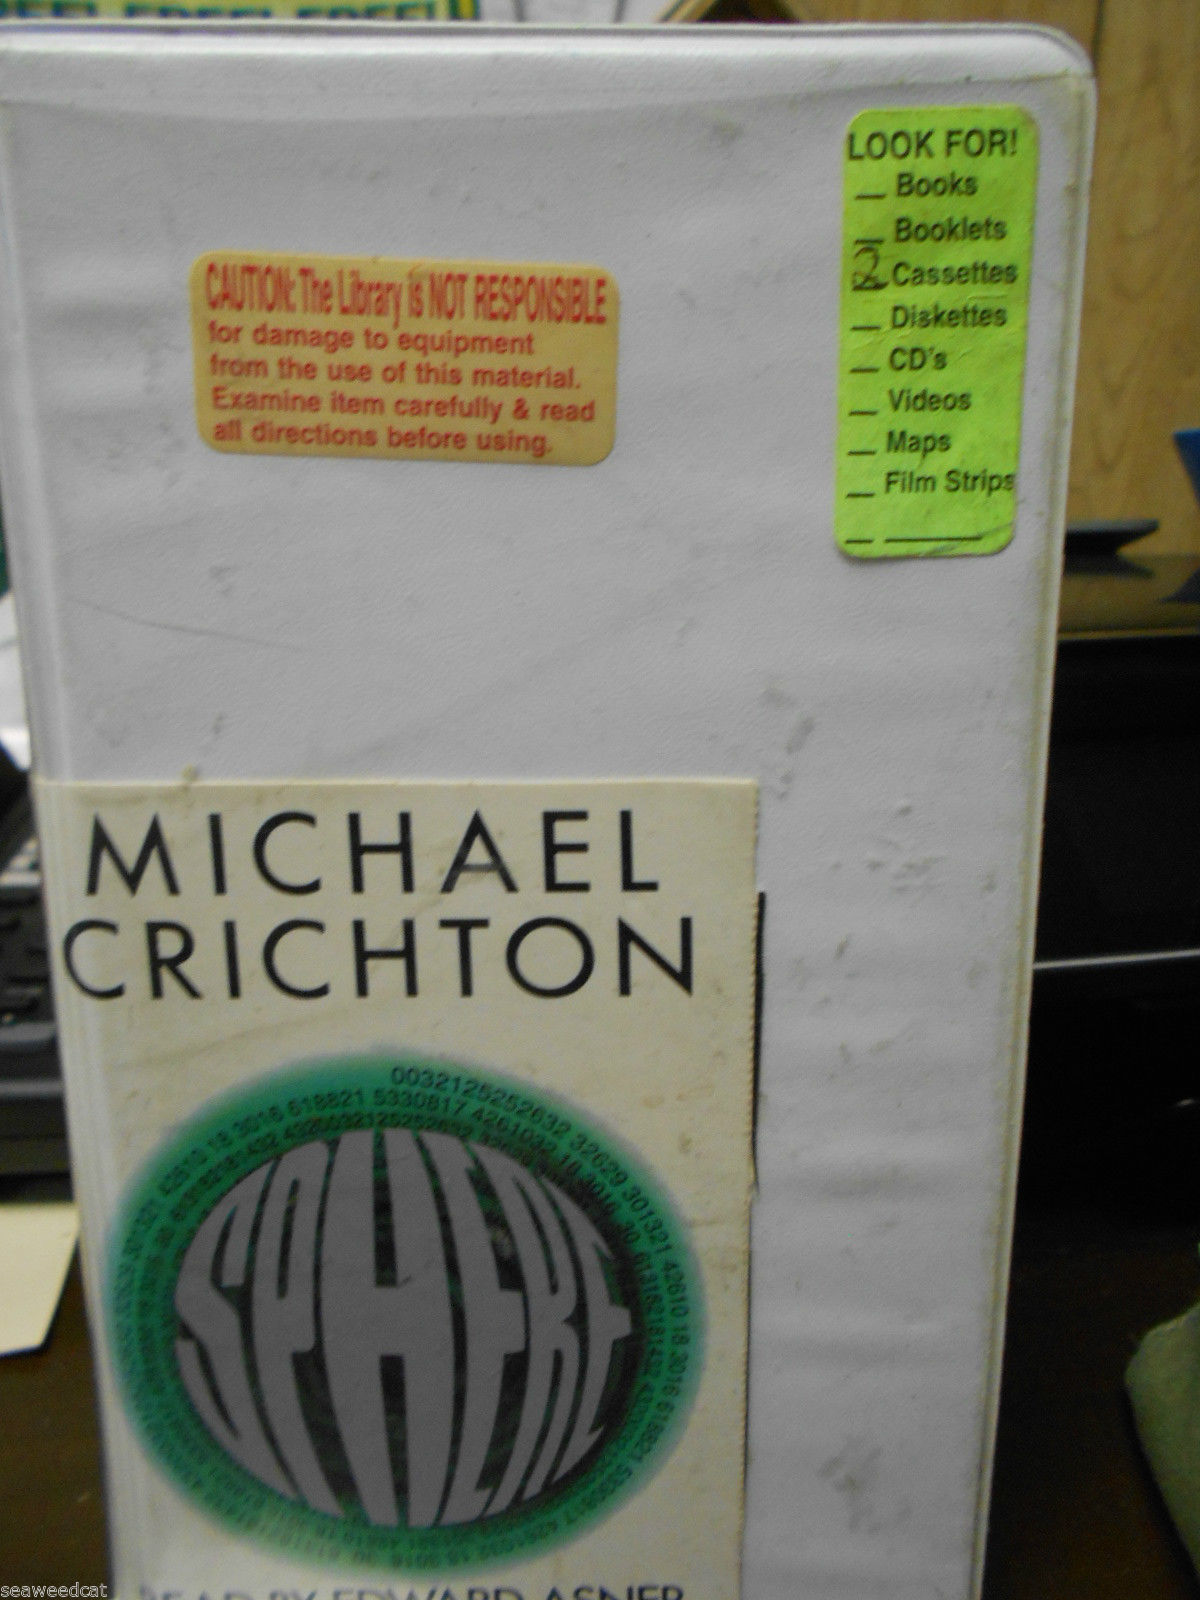 a description of the sphere by michael crichton Sphere 9780330301275 michael crichton pan macmillan 1988  sphere by michael crichton  description details within a.